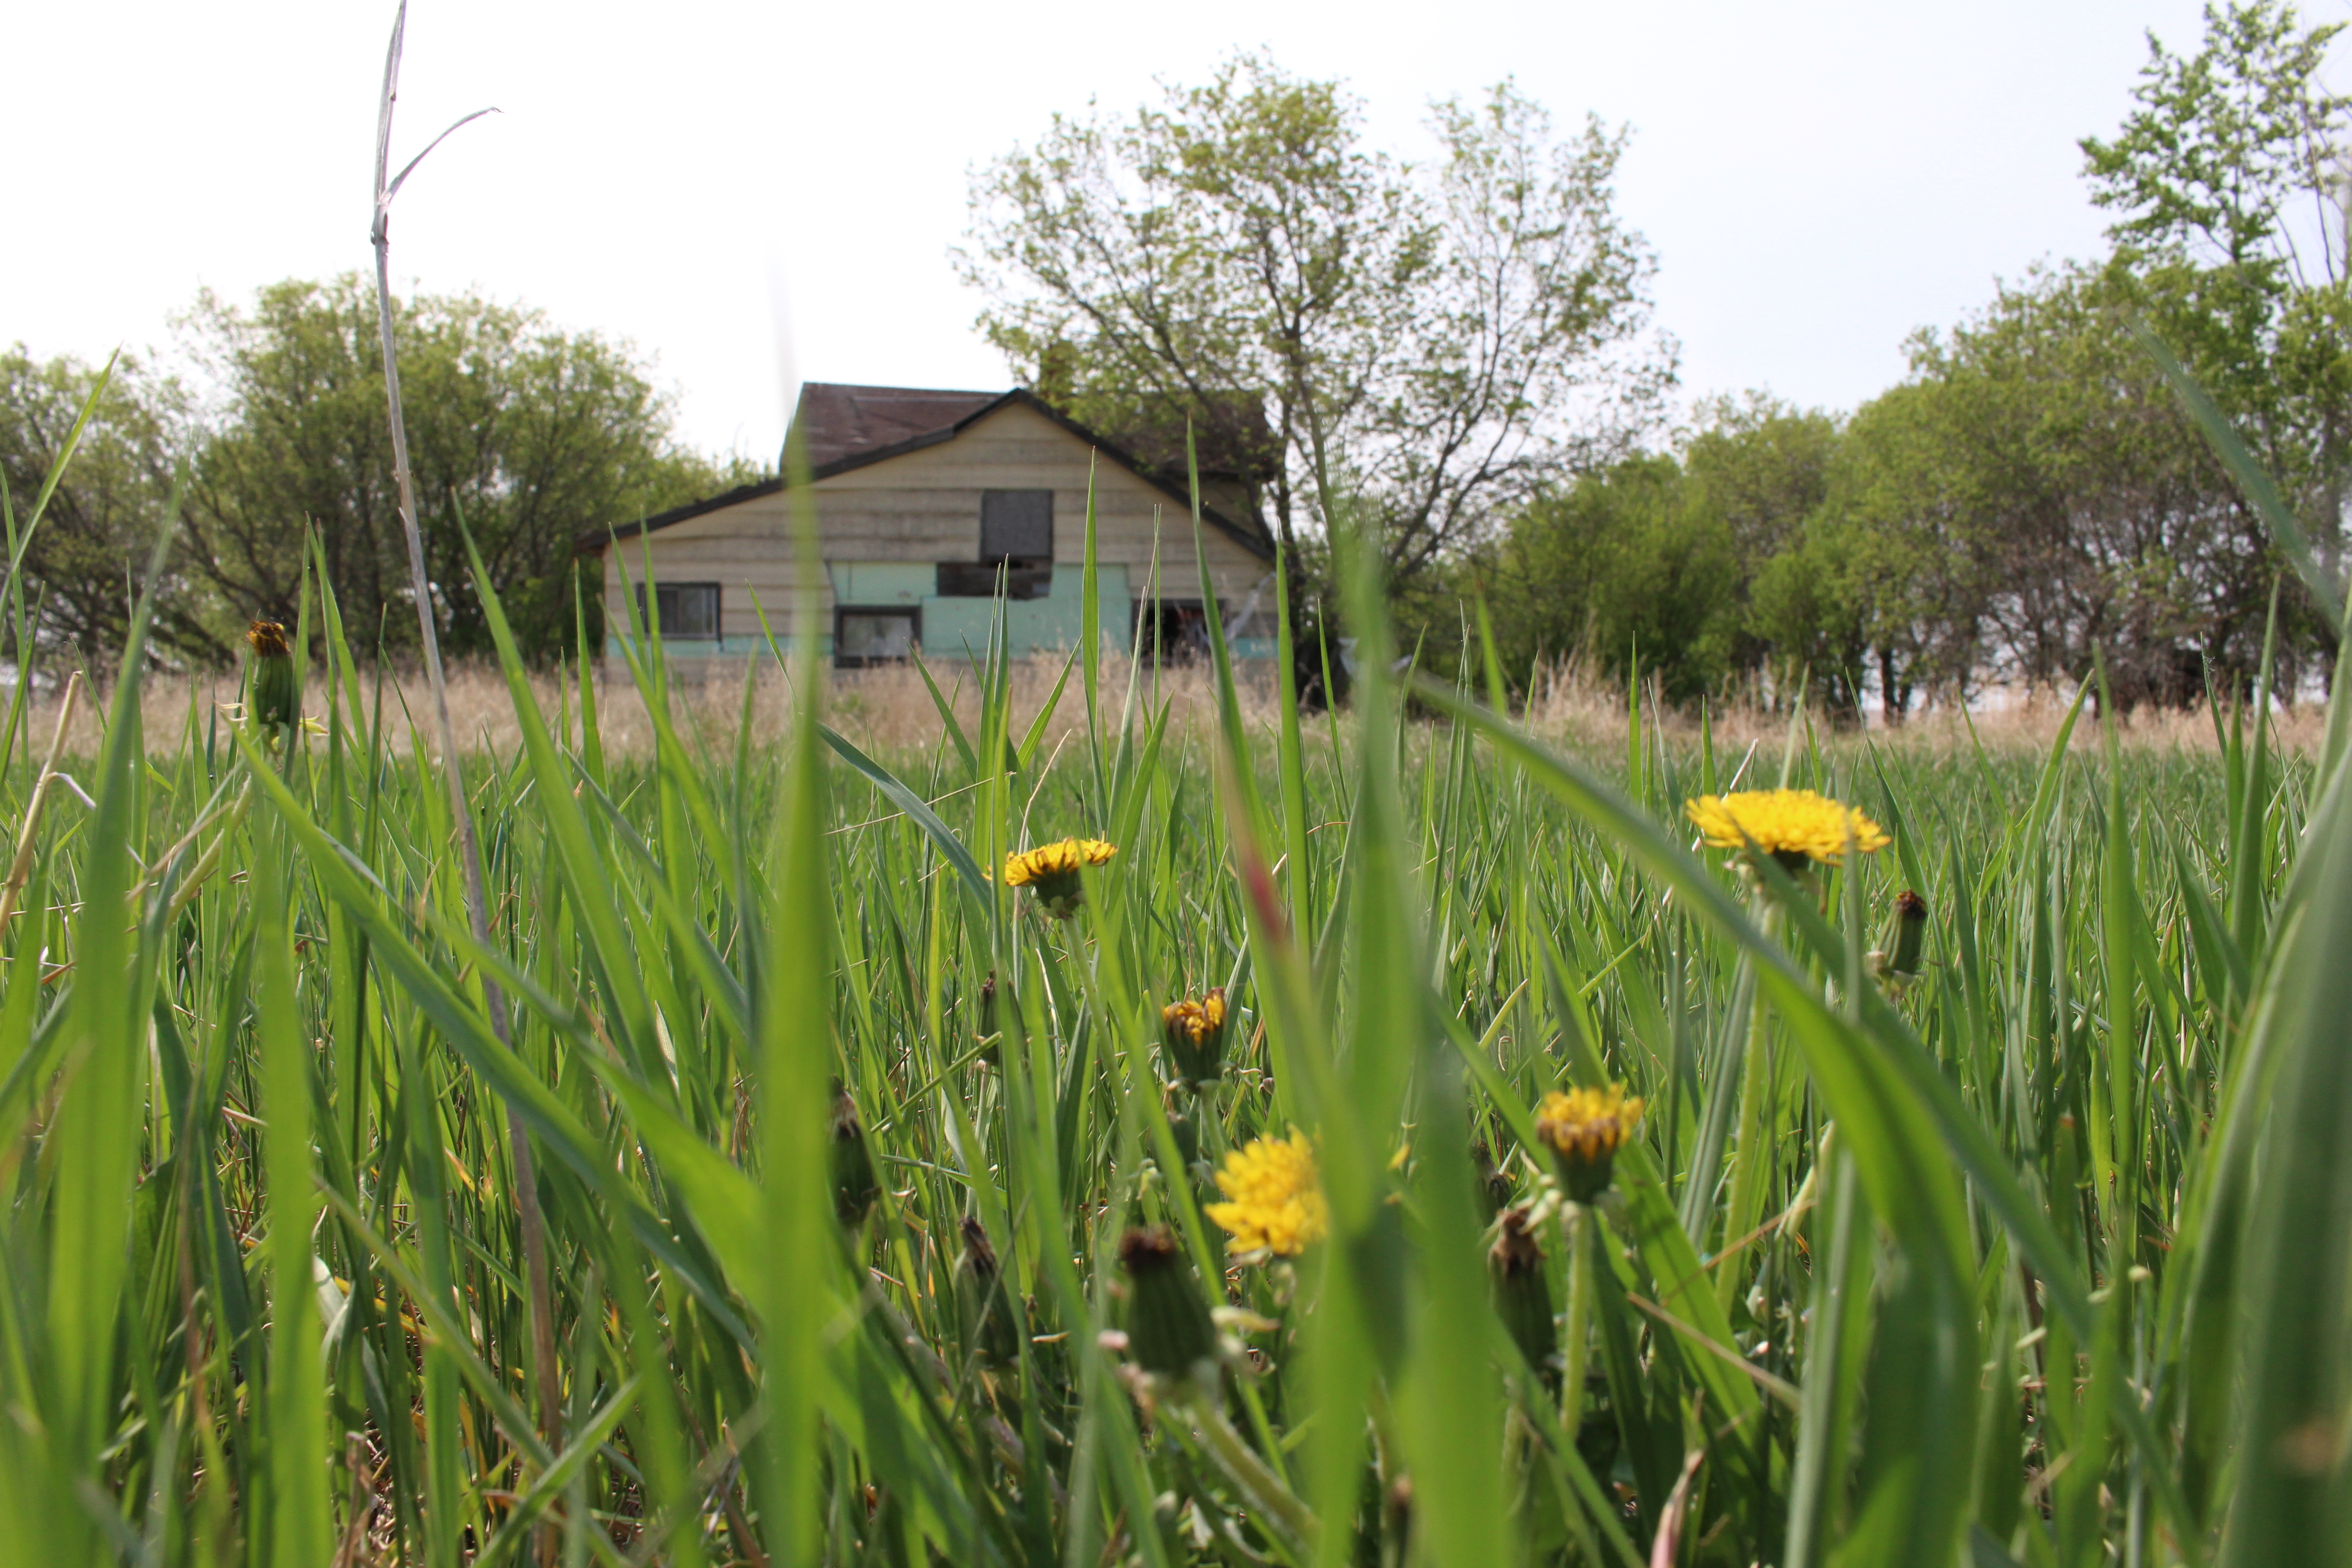 Greg Fertuck's childhood farmhouse. (Victoria Dinh/CBC)